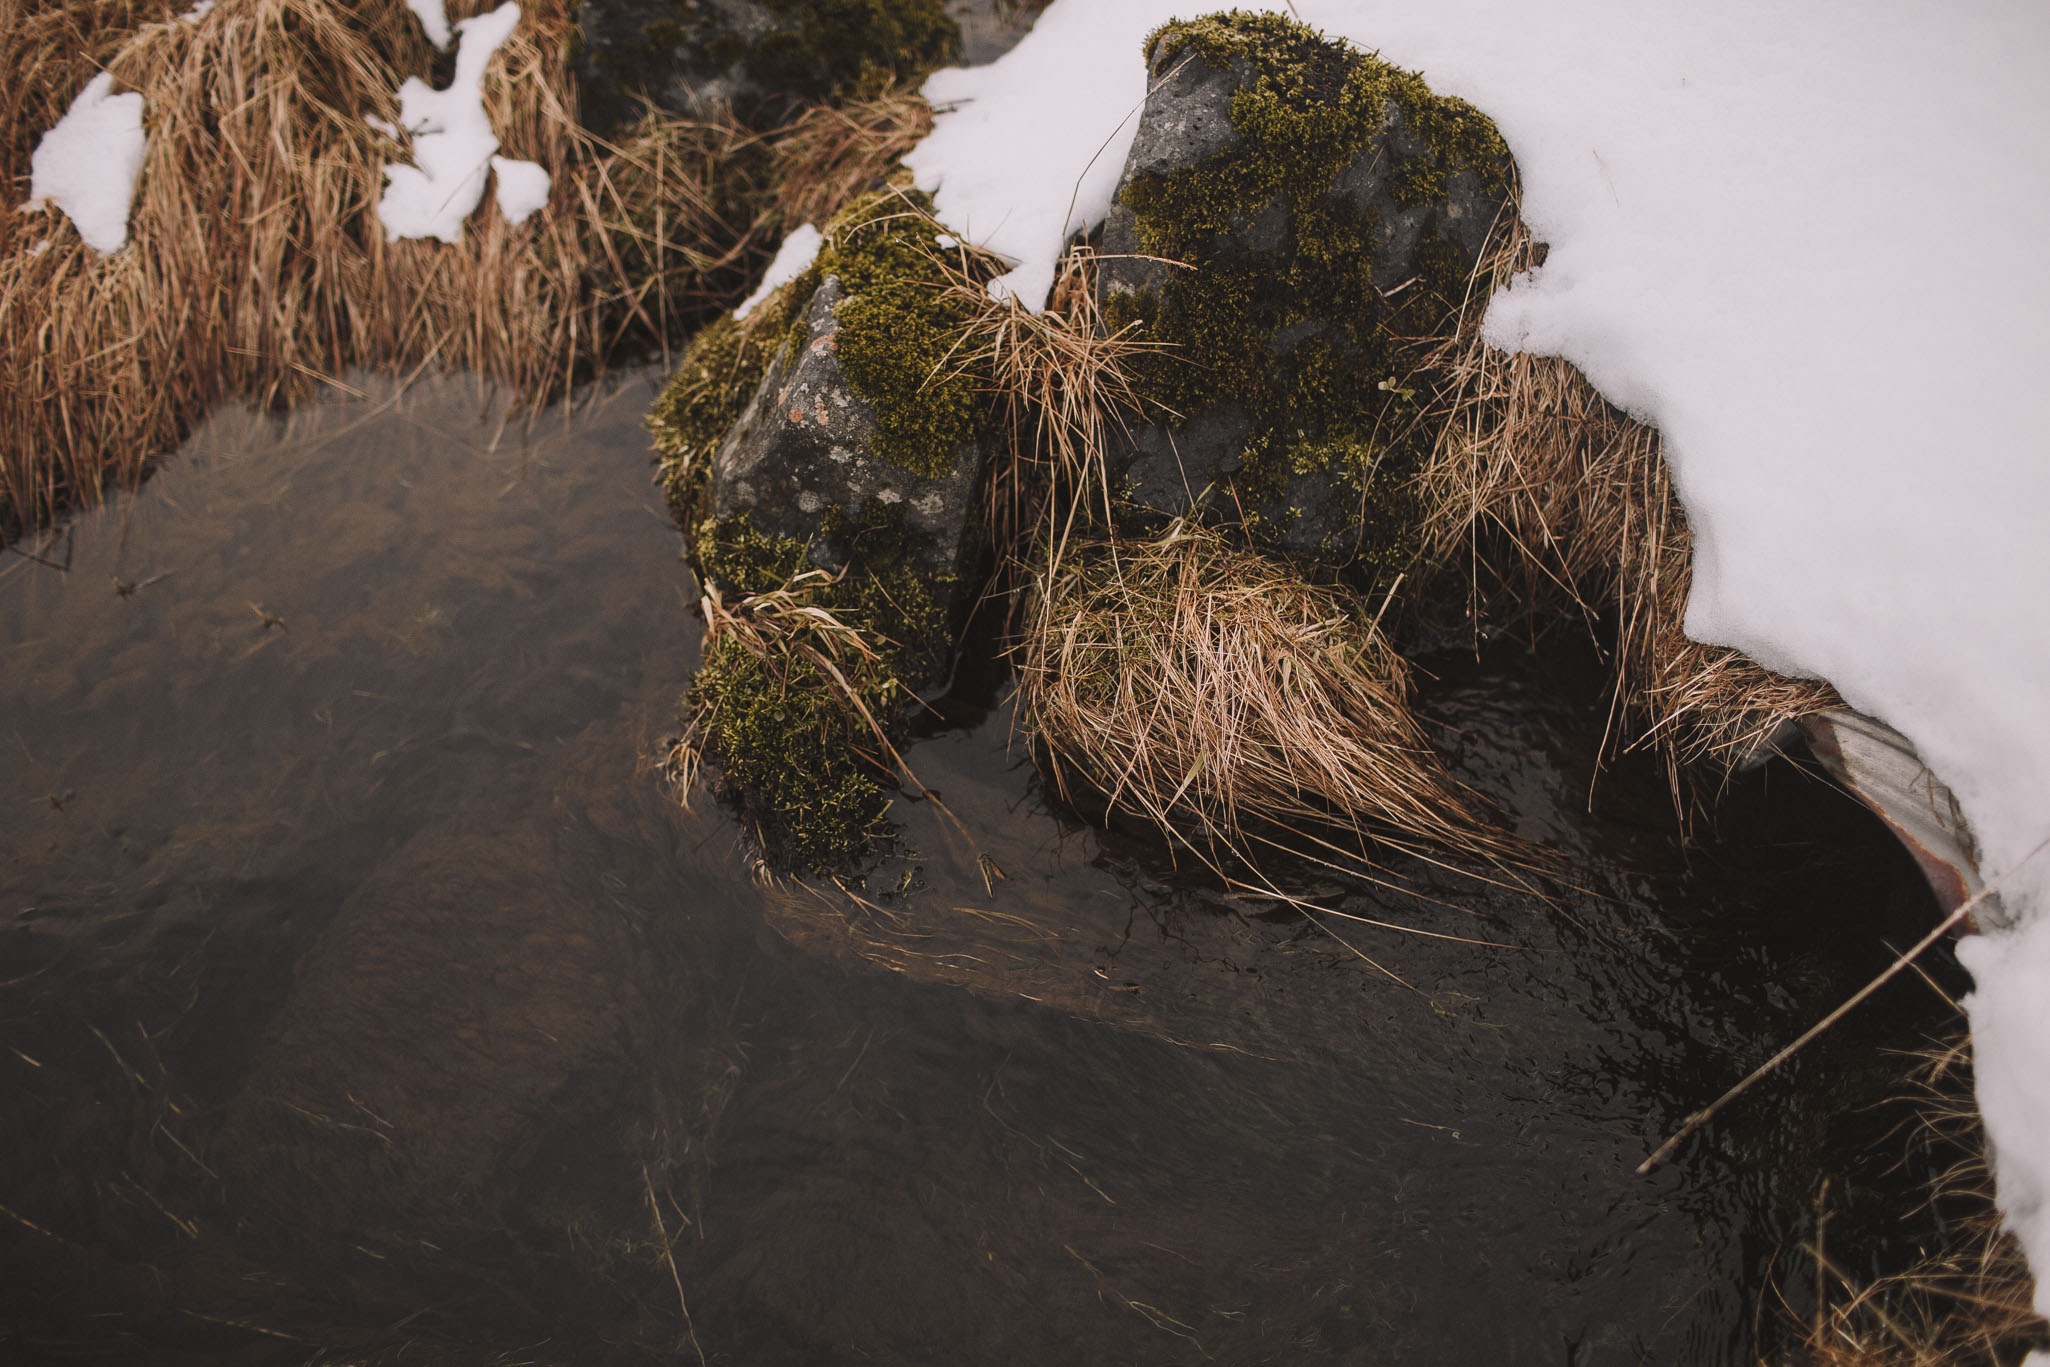 Road-trip-Islande-Iceland-Voyage-Travel-Portrait-Jérémy-Boyer-Cascade-waterfall-foss-Seljalandsfoss-4.jpg